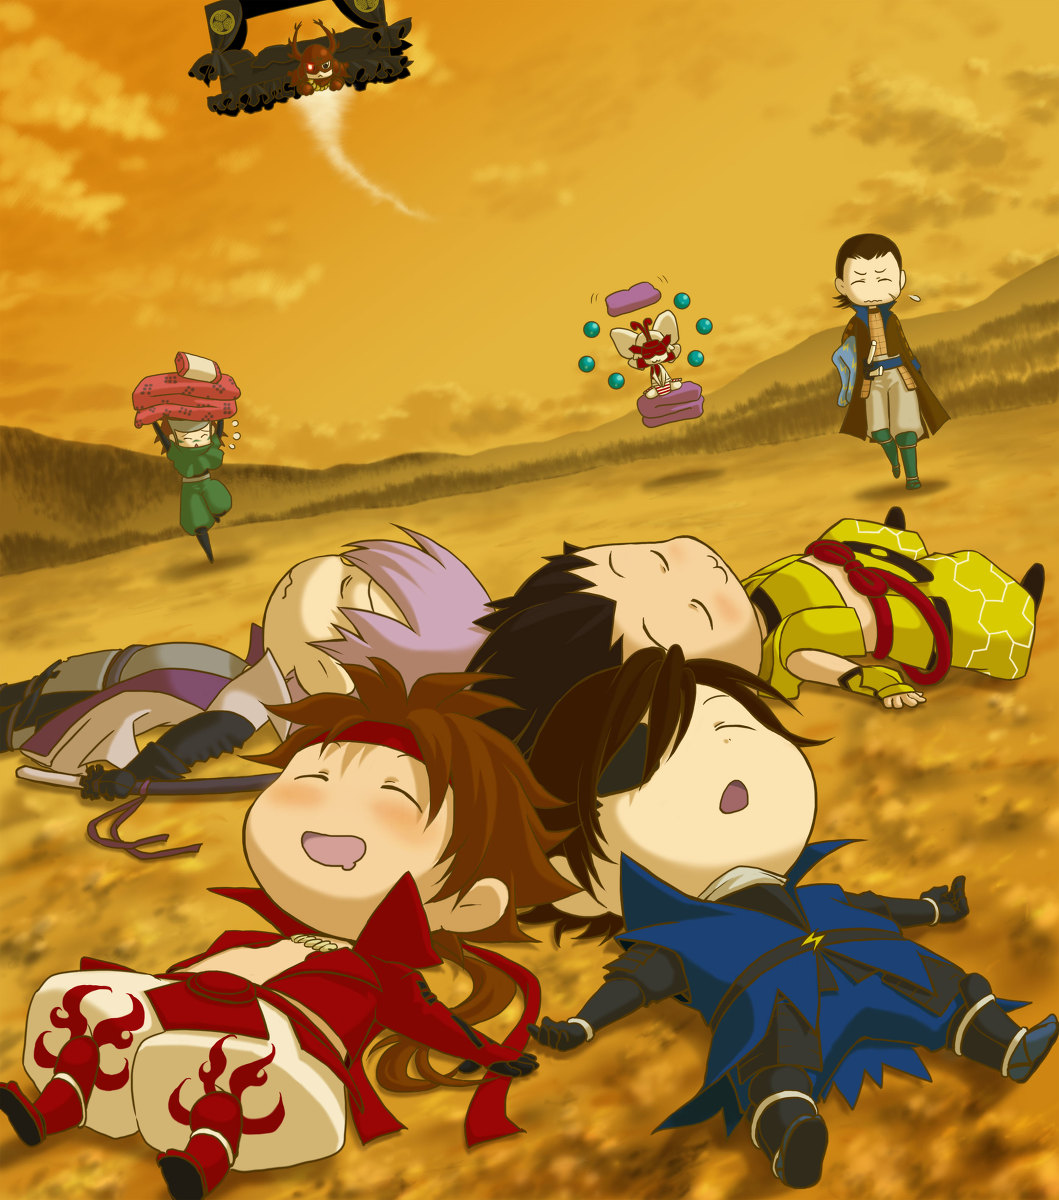 Download Anime Basara: Tokugawa Ieyasu (Sengoku Basara), Fanart